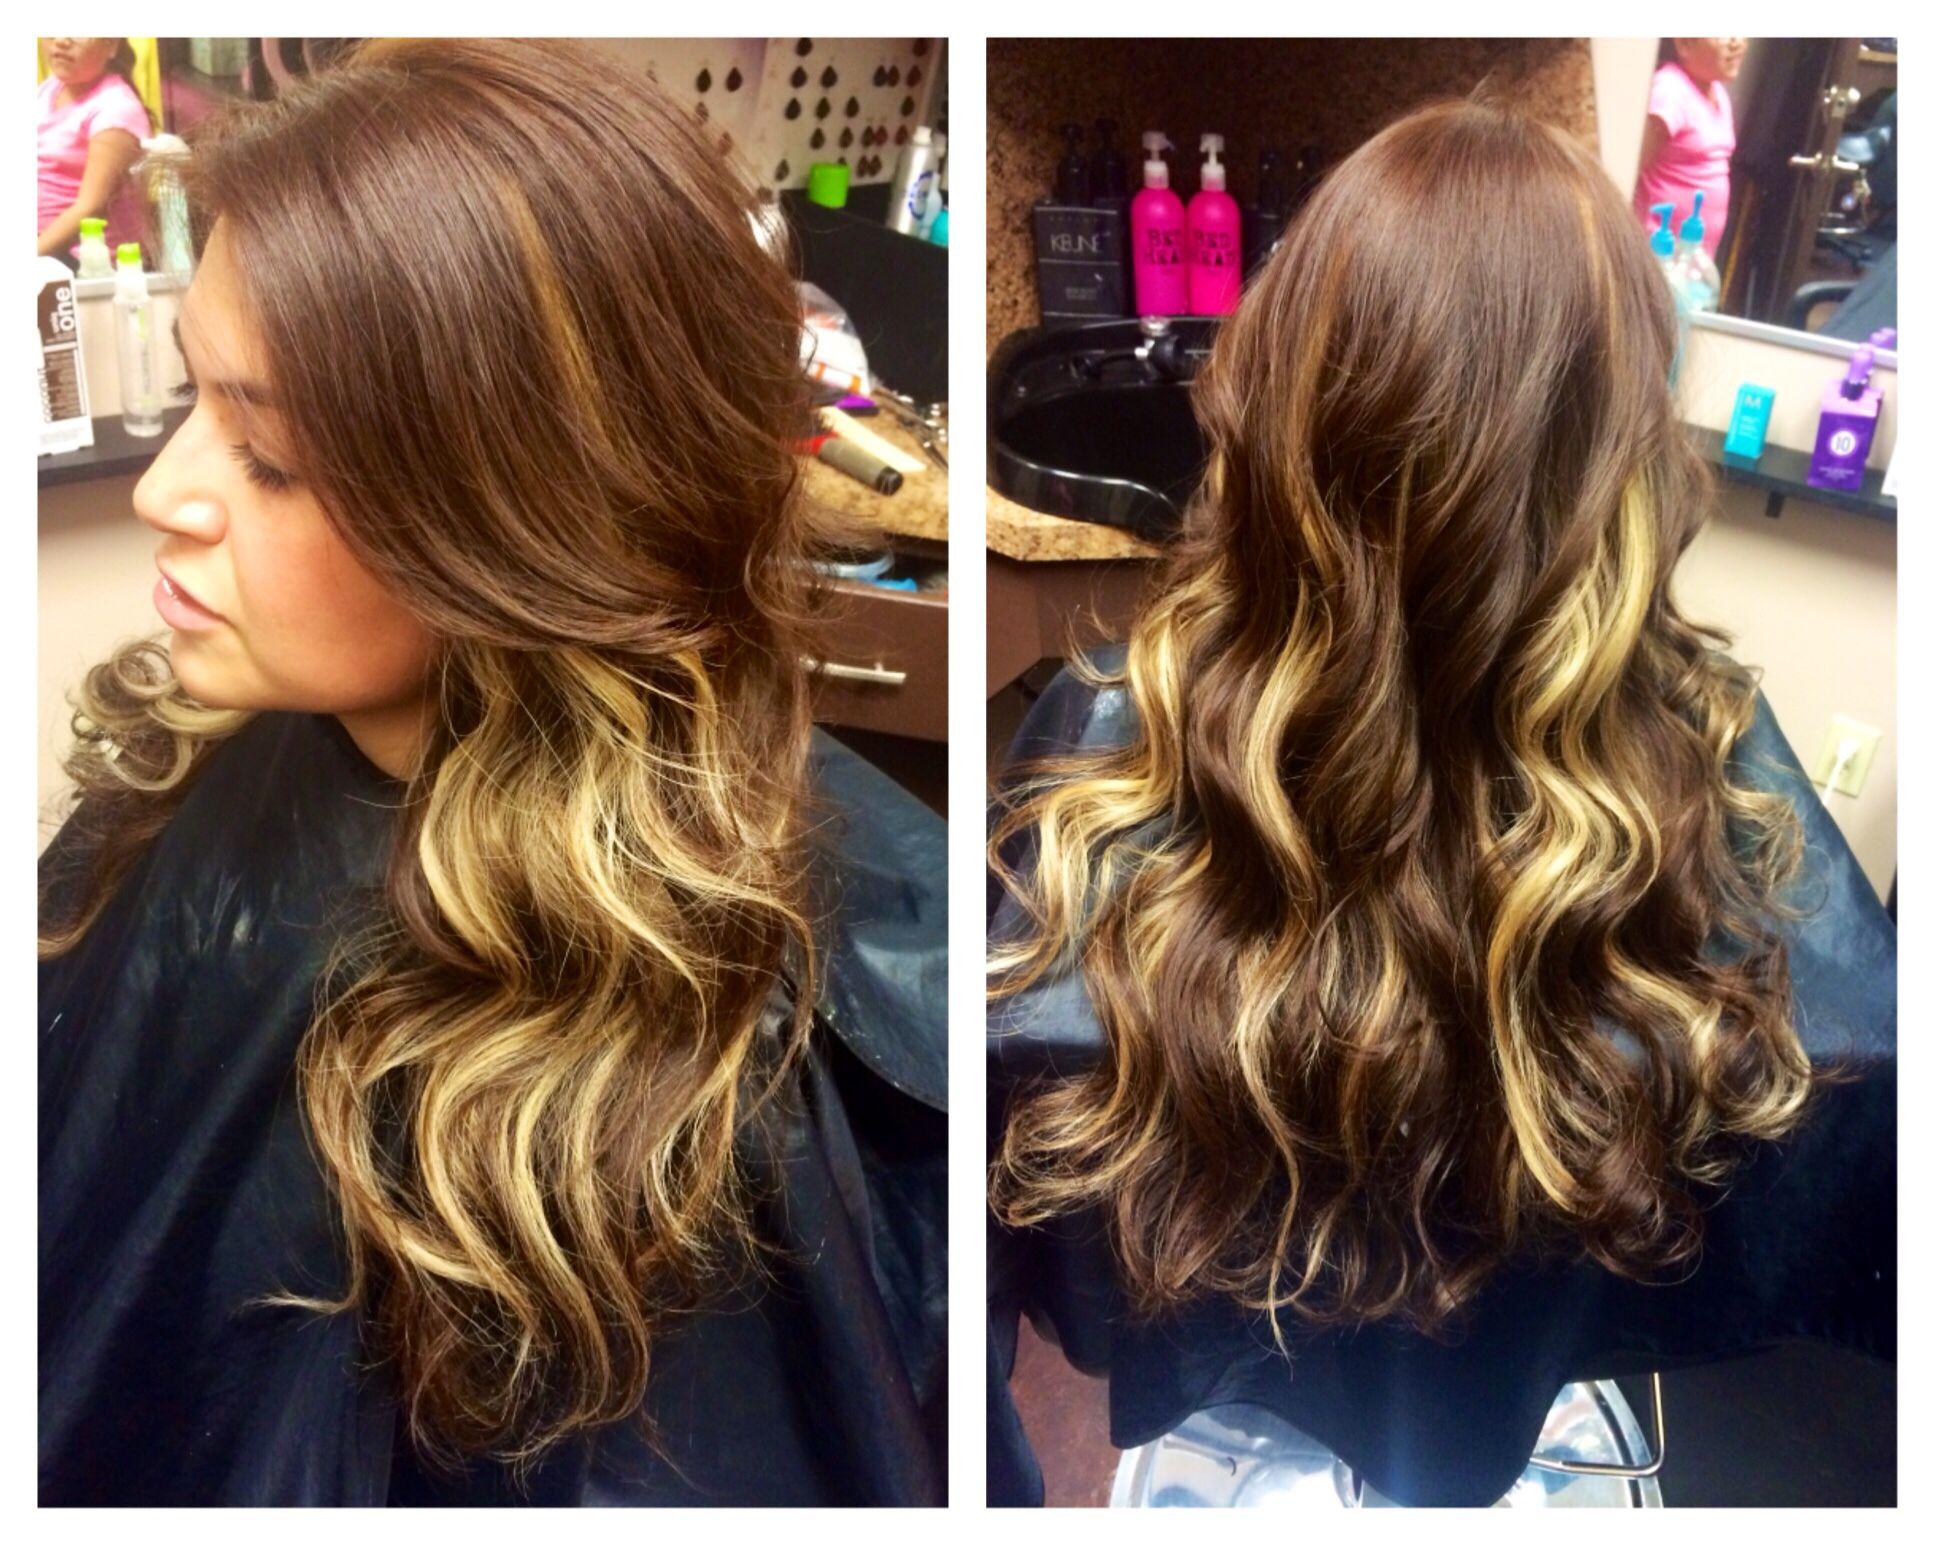 Peekaboo Hair Styles: Peekaboo Highlights #HairFairy